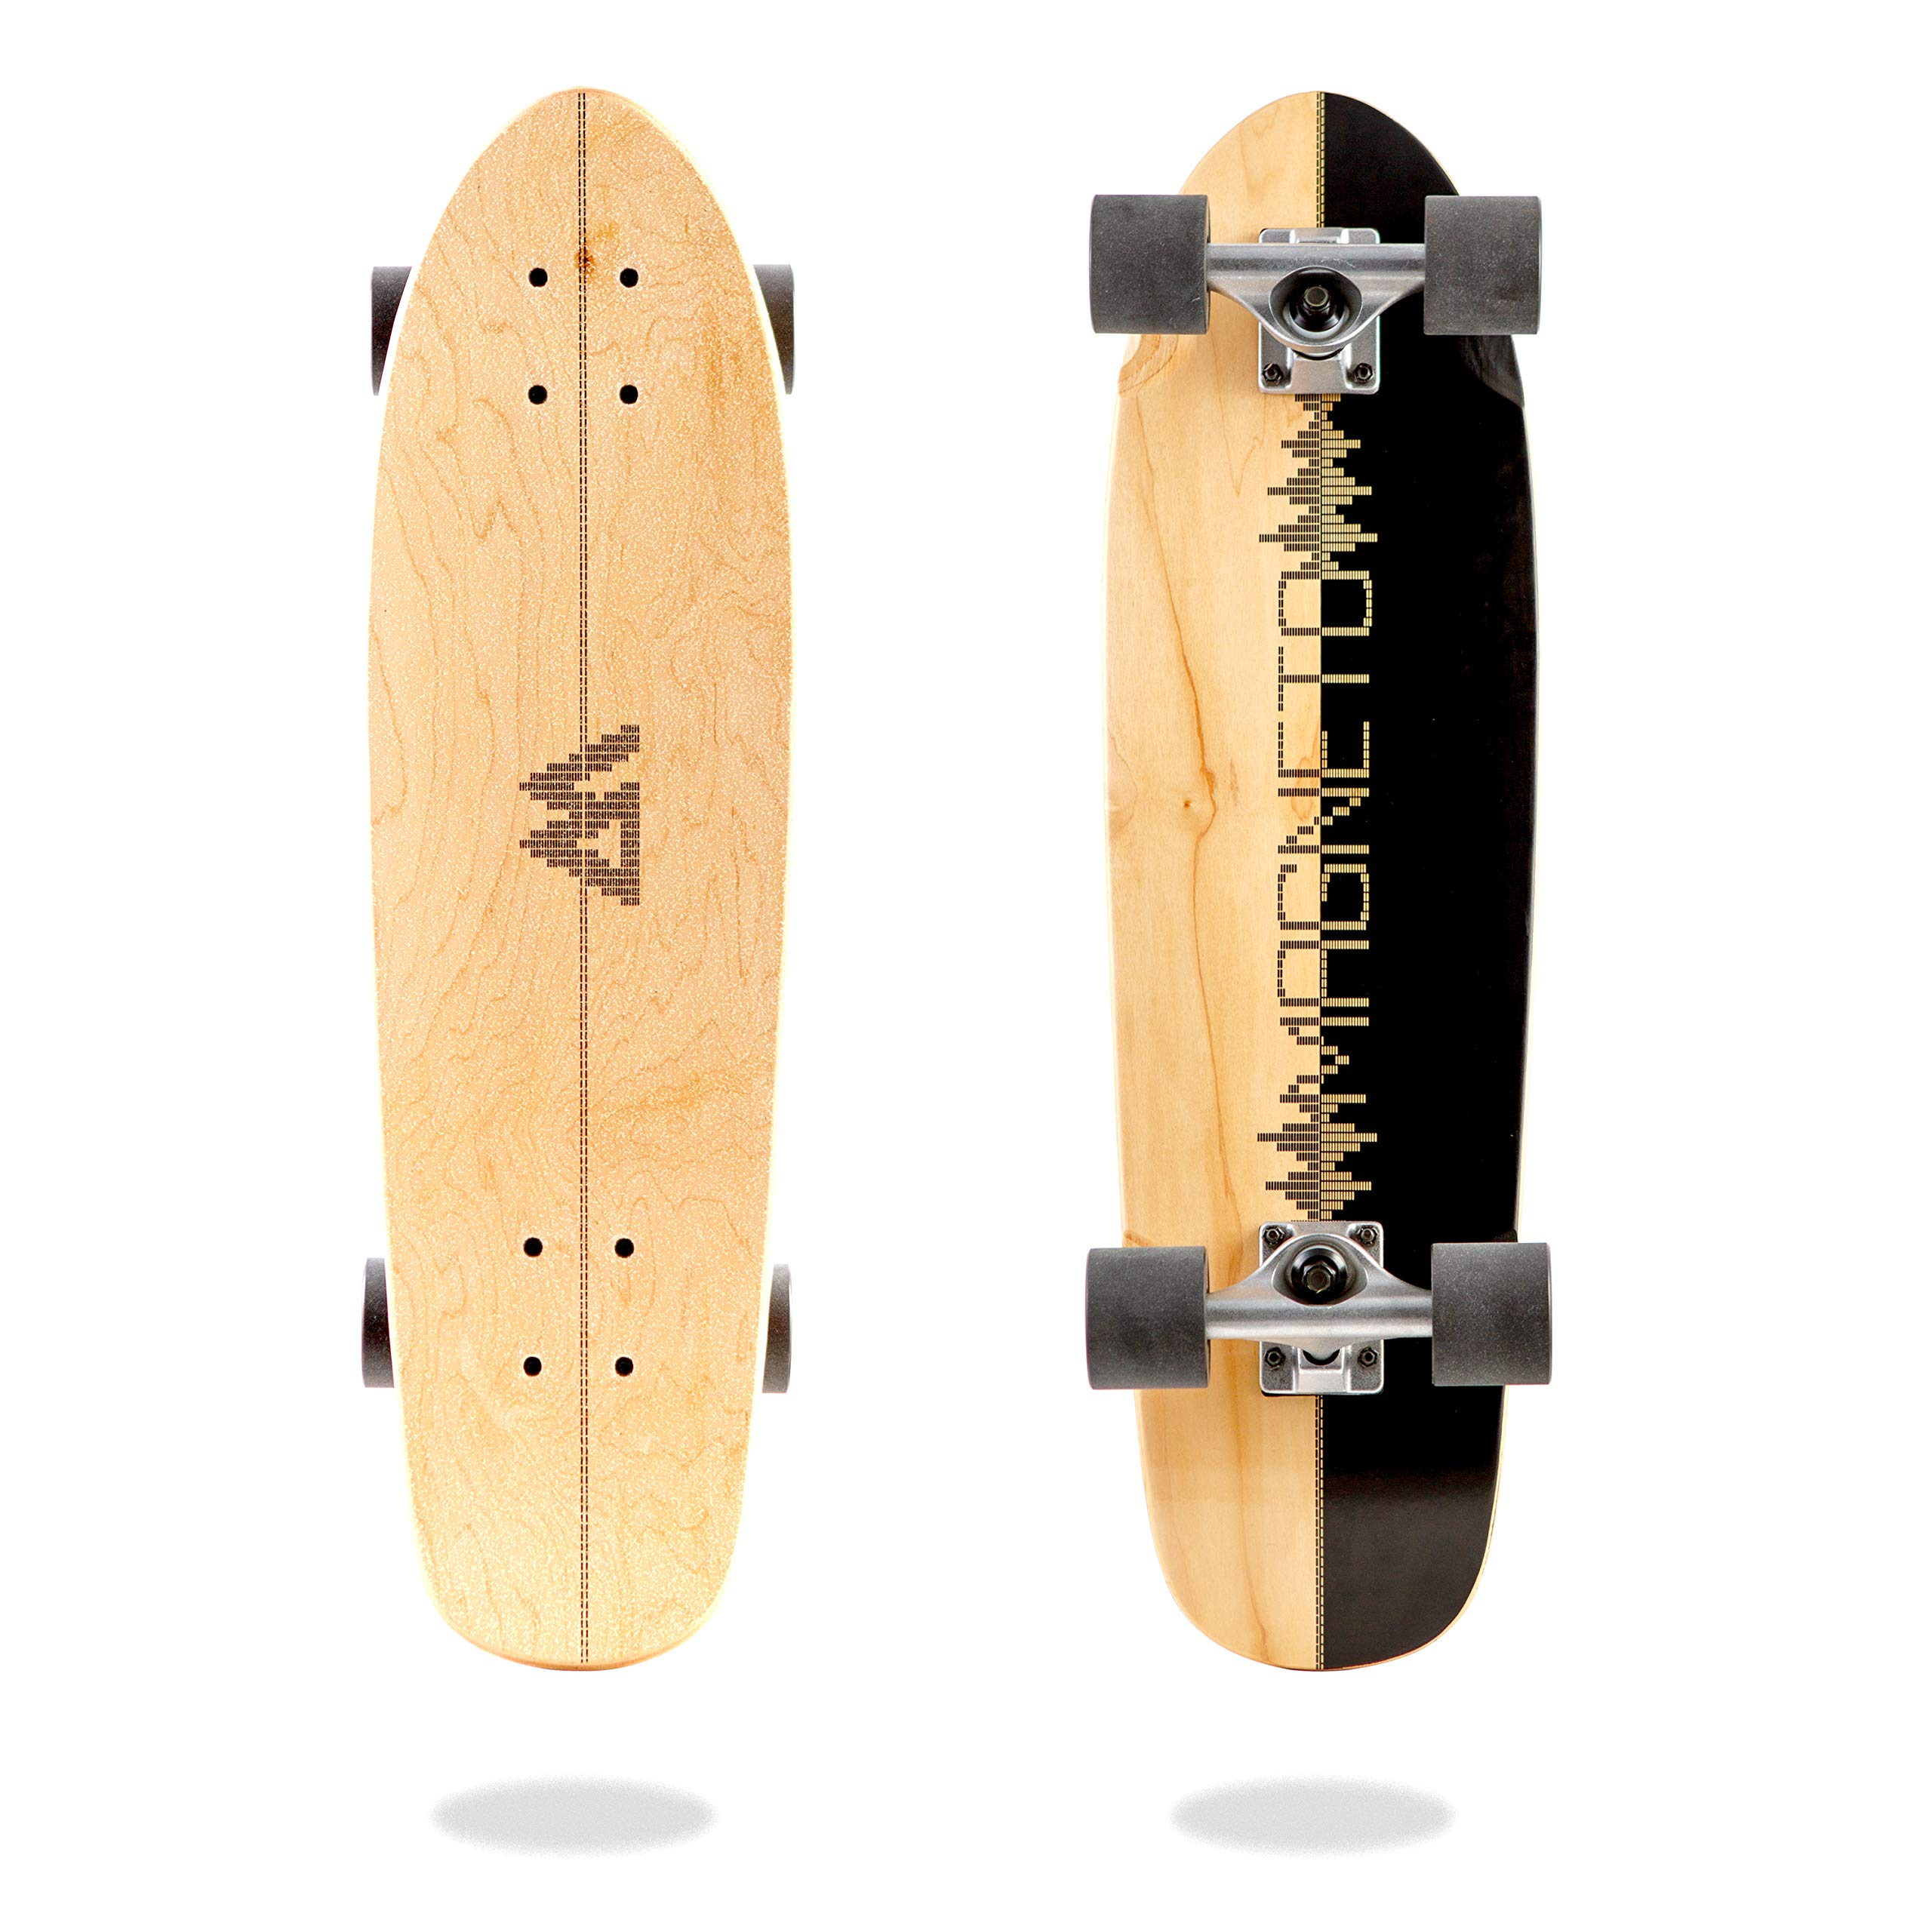 Magneto Mini Cruiser Skateboard Cruiser   Short Board   Canadian Maple Deck - Designed for Kids, Teens and Adults … (Music)